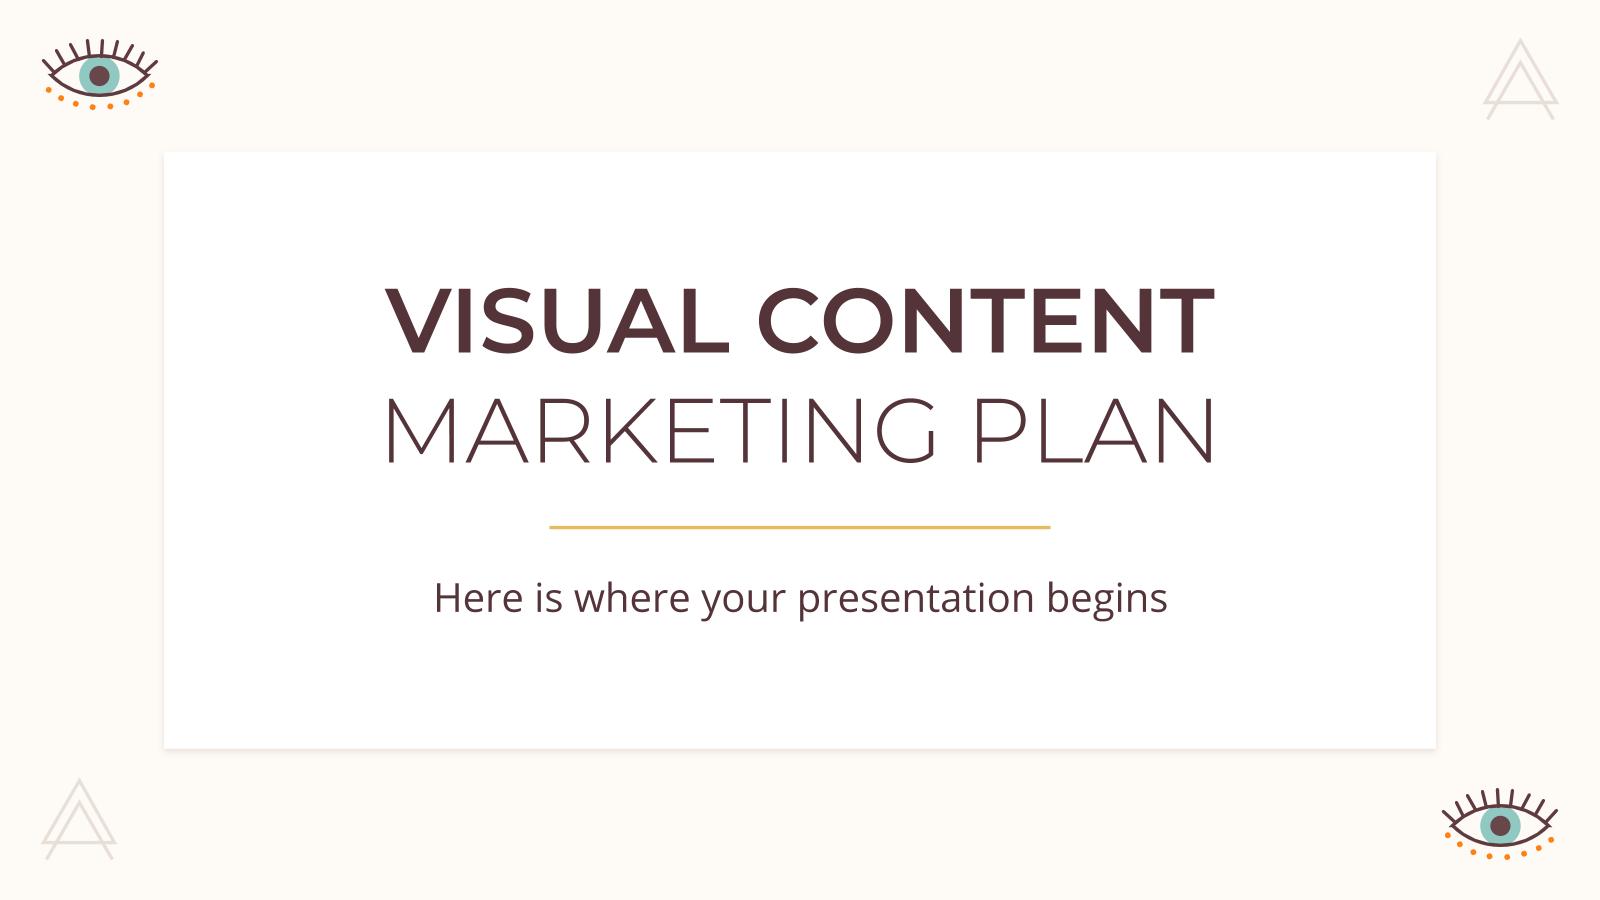 Visual Content Marketing Plan presentation template